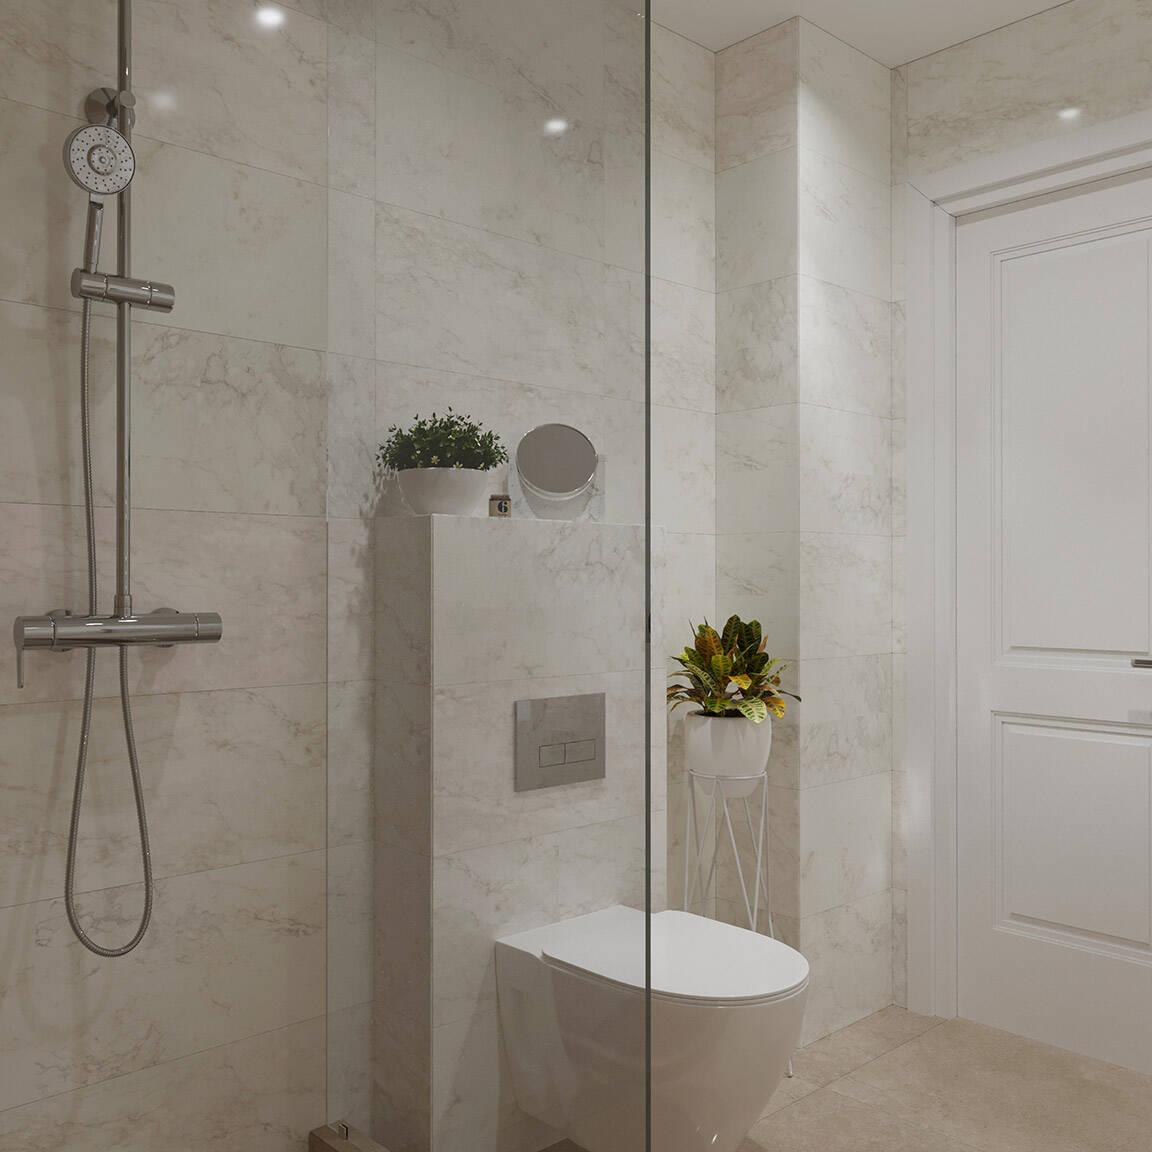 Catedral Residence - Bathroom - Marazzi Ceramic tiles - 16